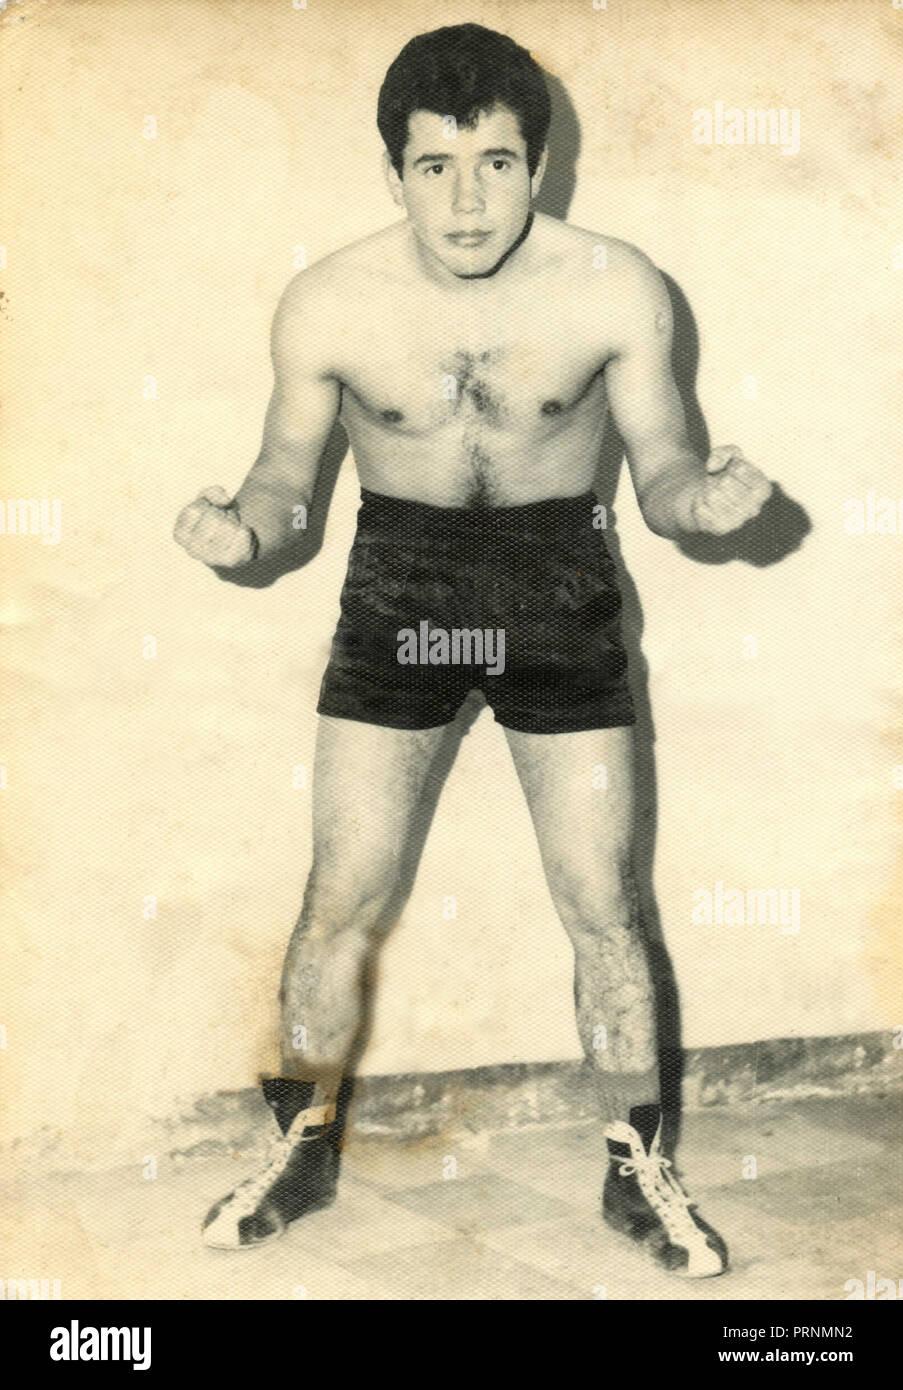 Atleta de boxeo italiano Roberto Paoletti, 1960 Imagen De Stock